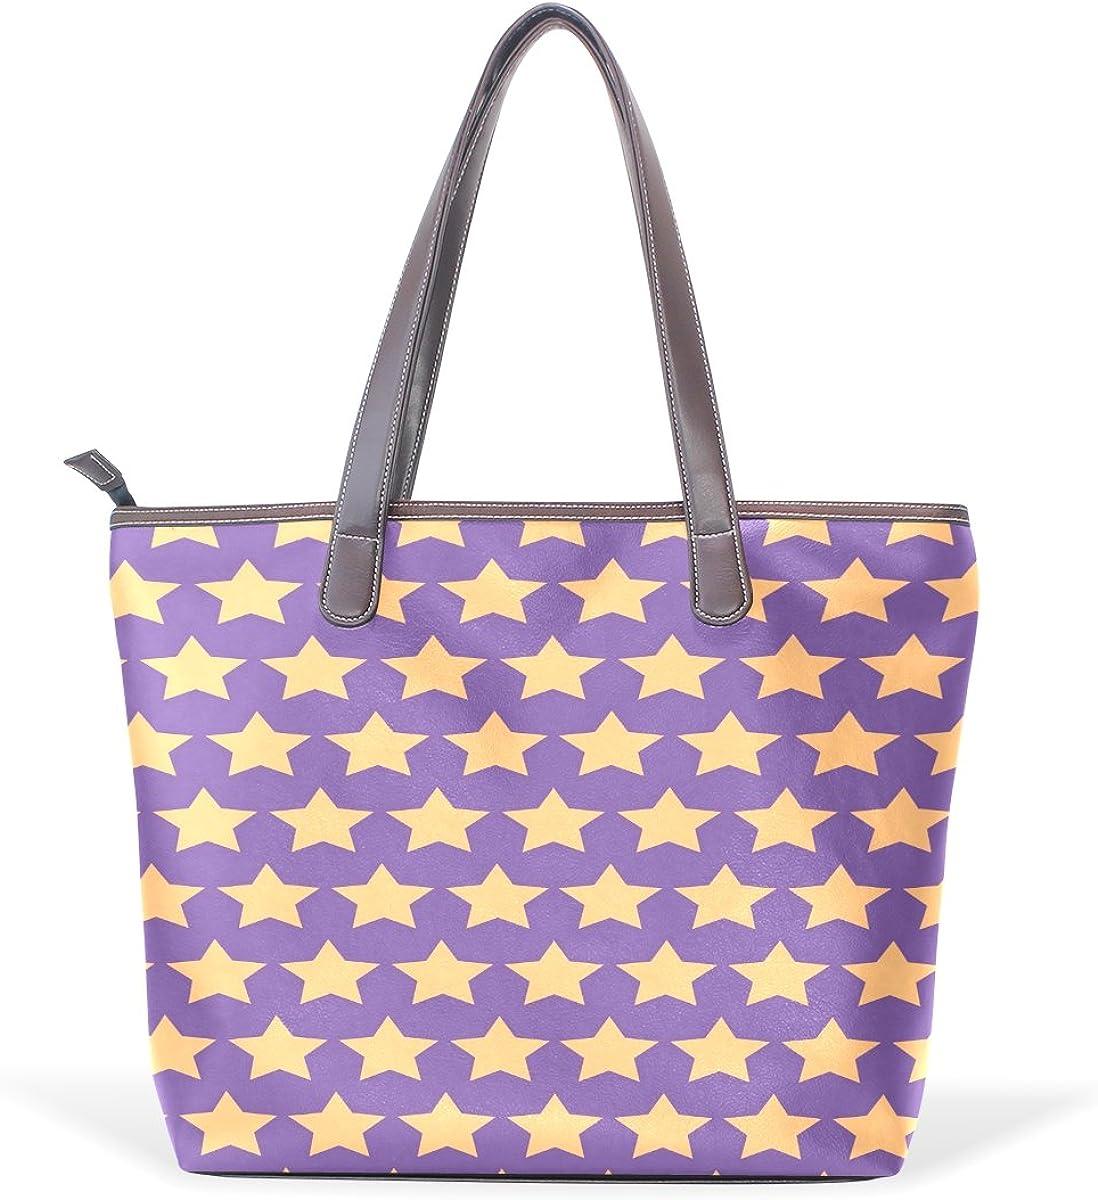 Ye Store Cute Pink Pattern Lady PU Leather Handbag Tote Bag Shoulder Bag Shopping Bag